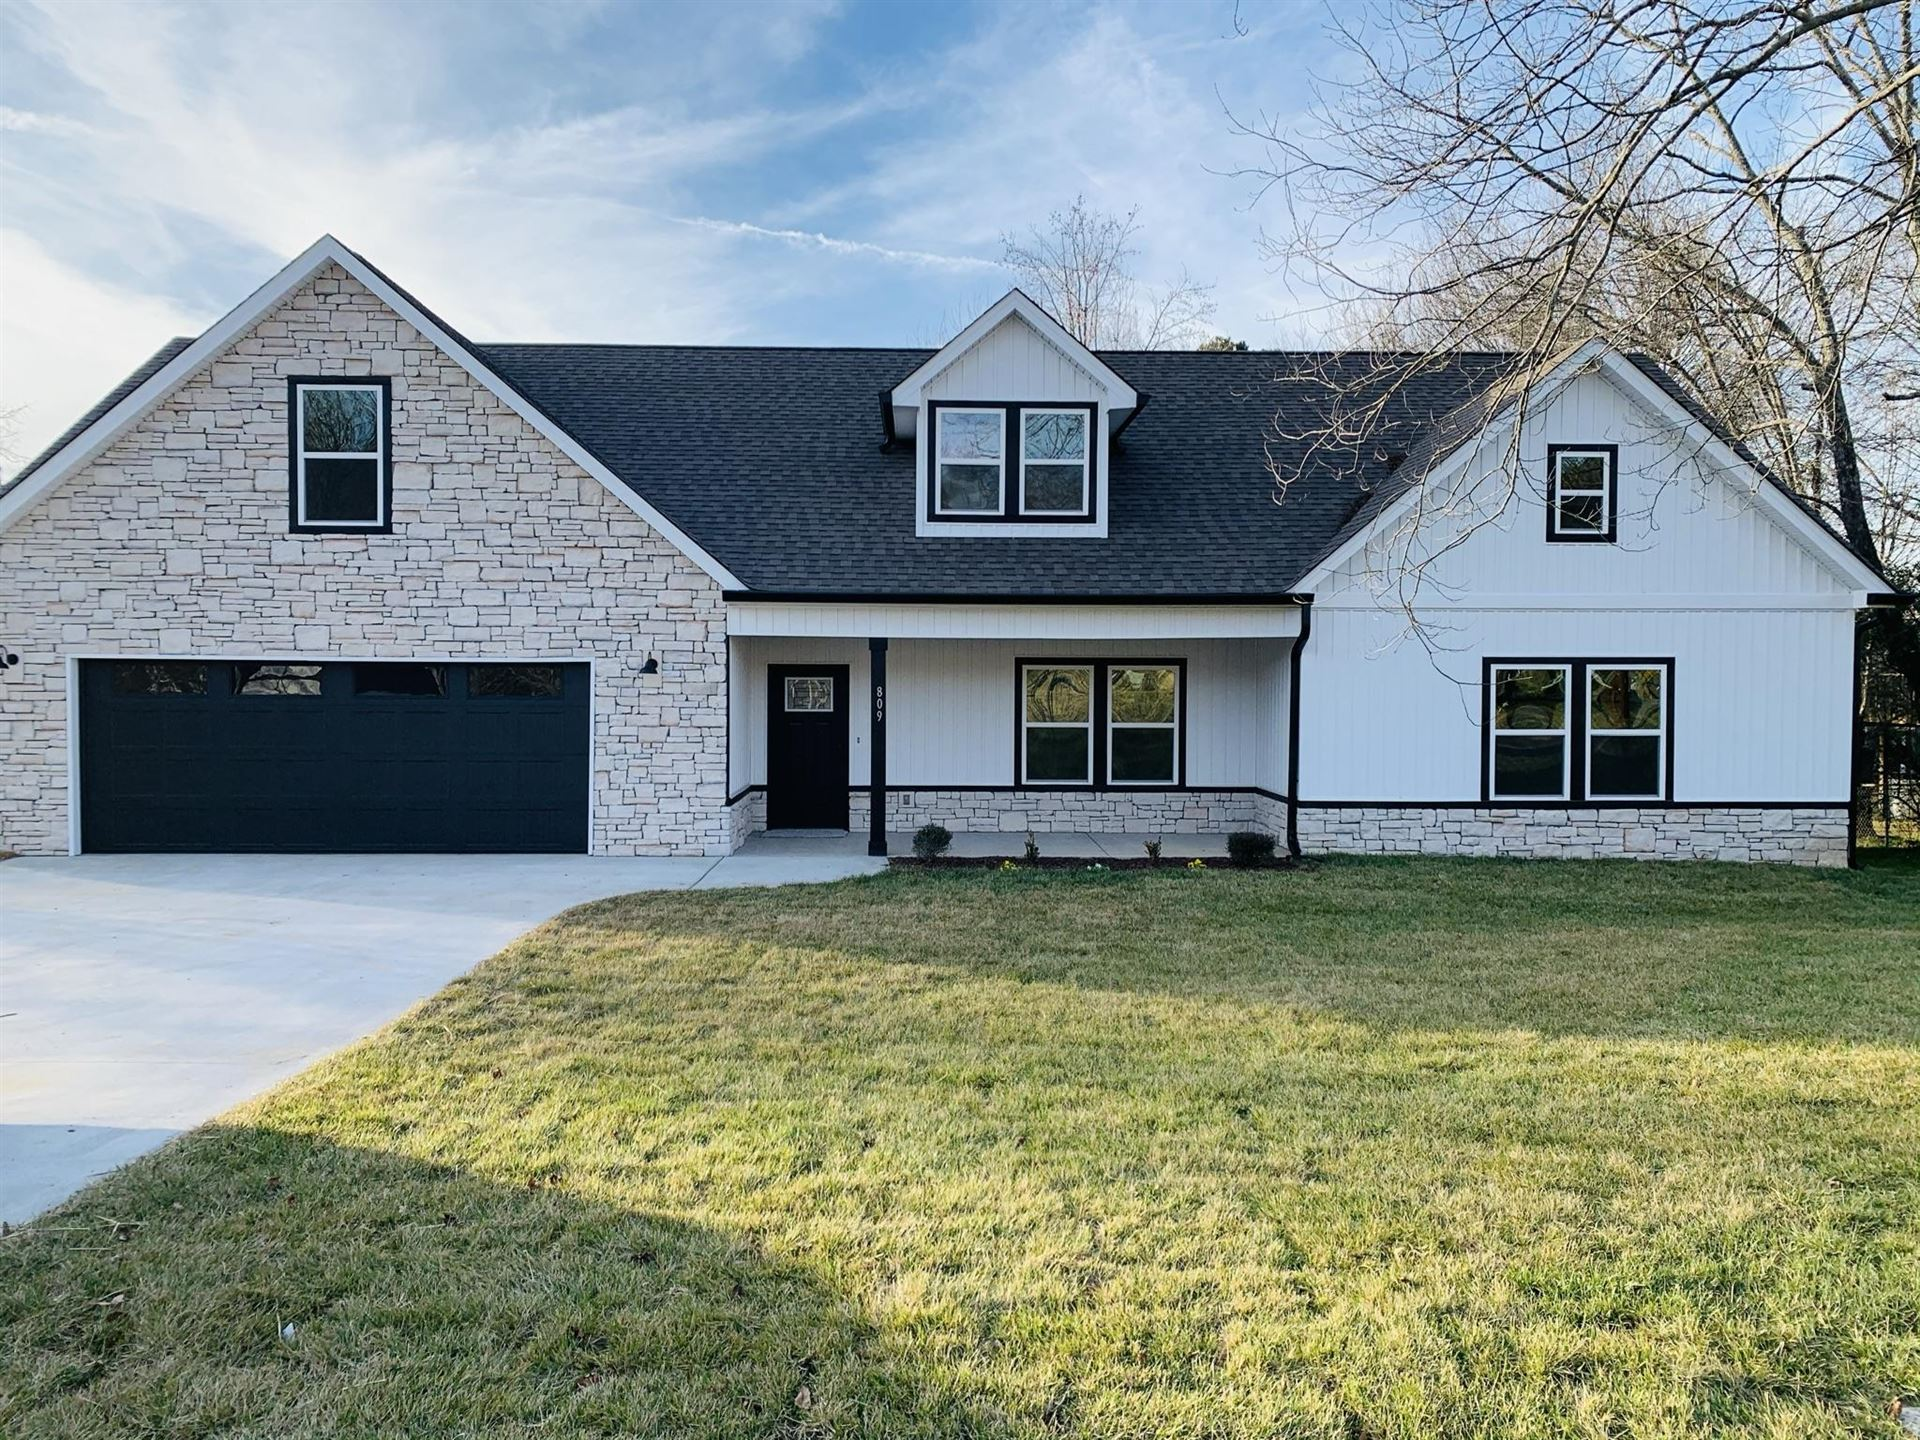 809 Gentry Rd, Chattanooga, TN 37421 - #: 1319021